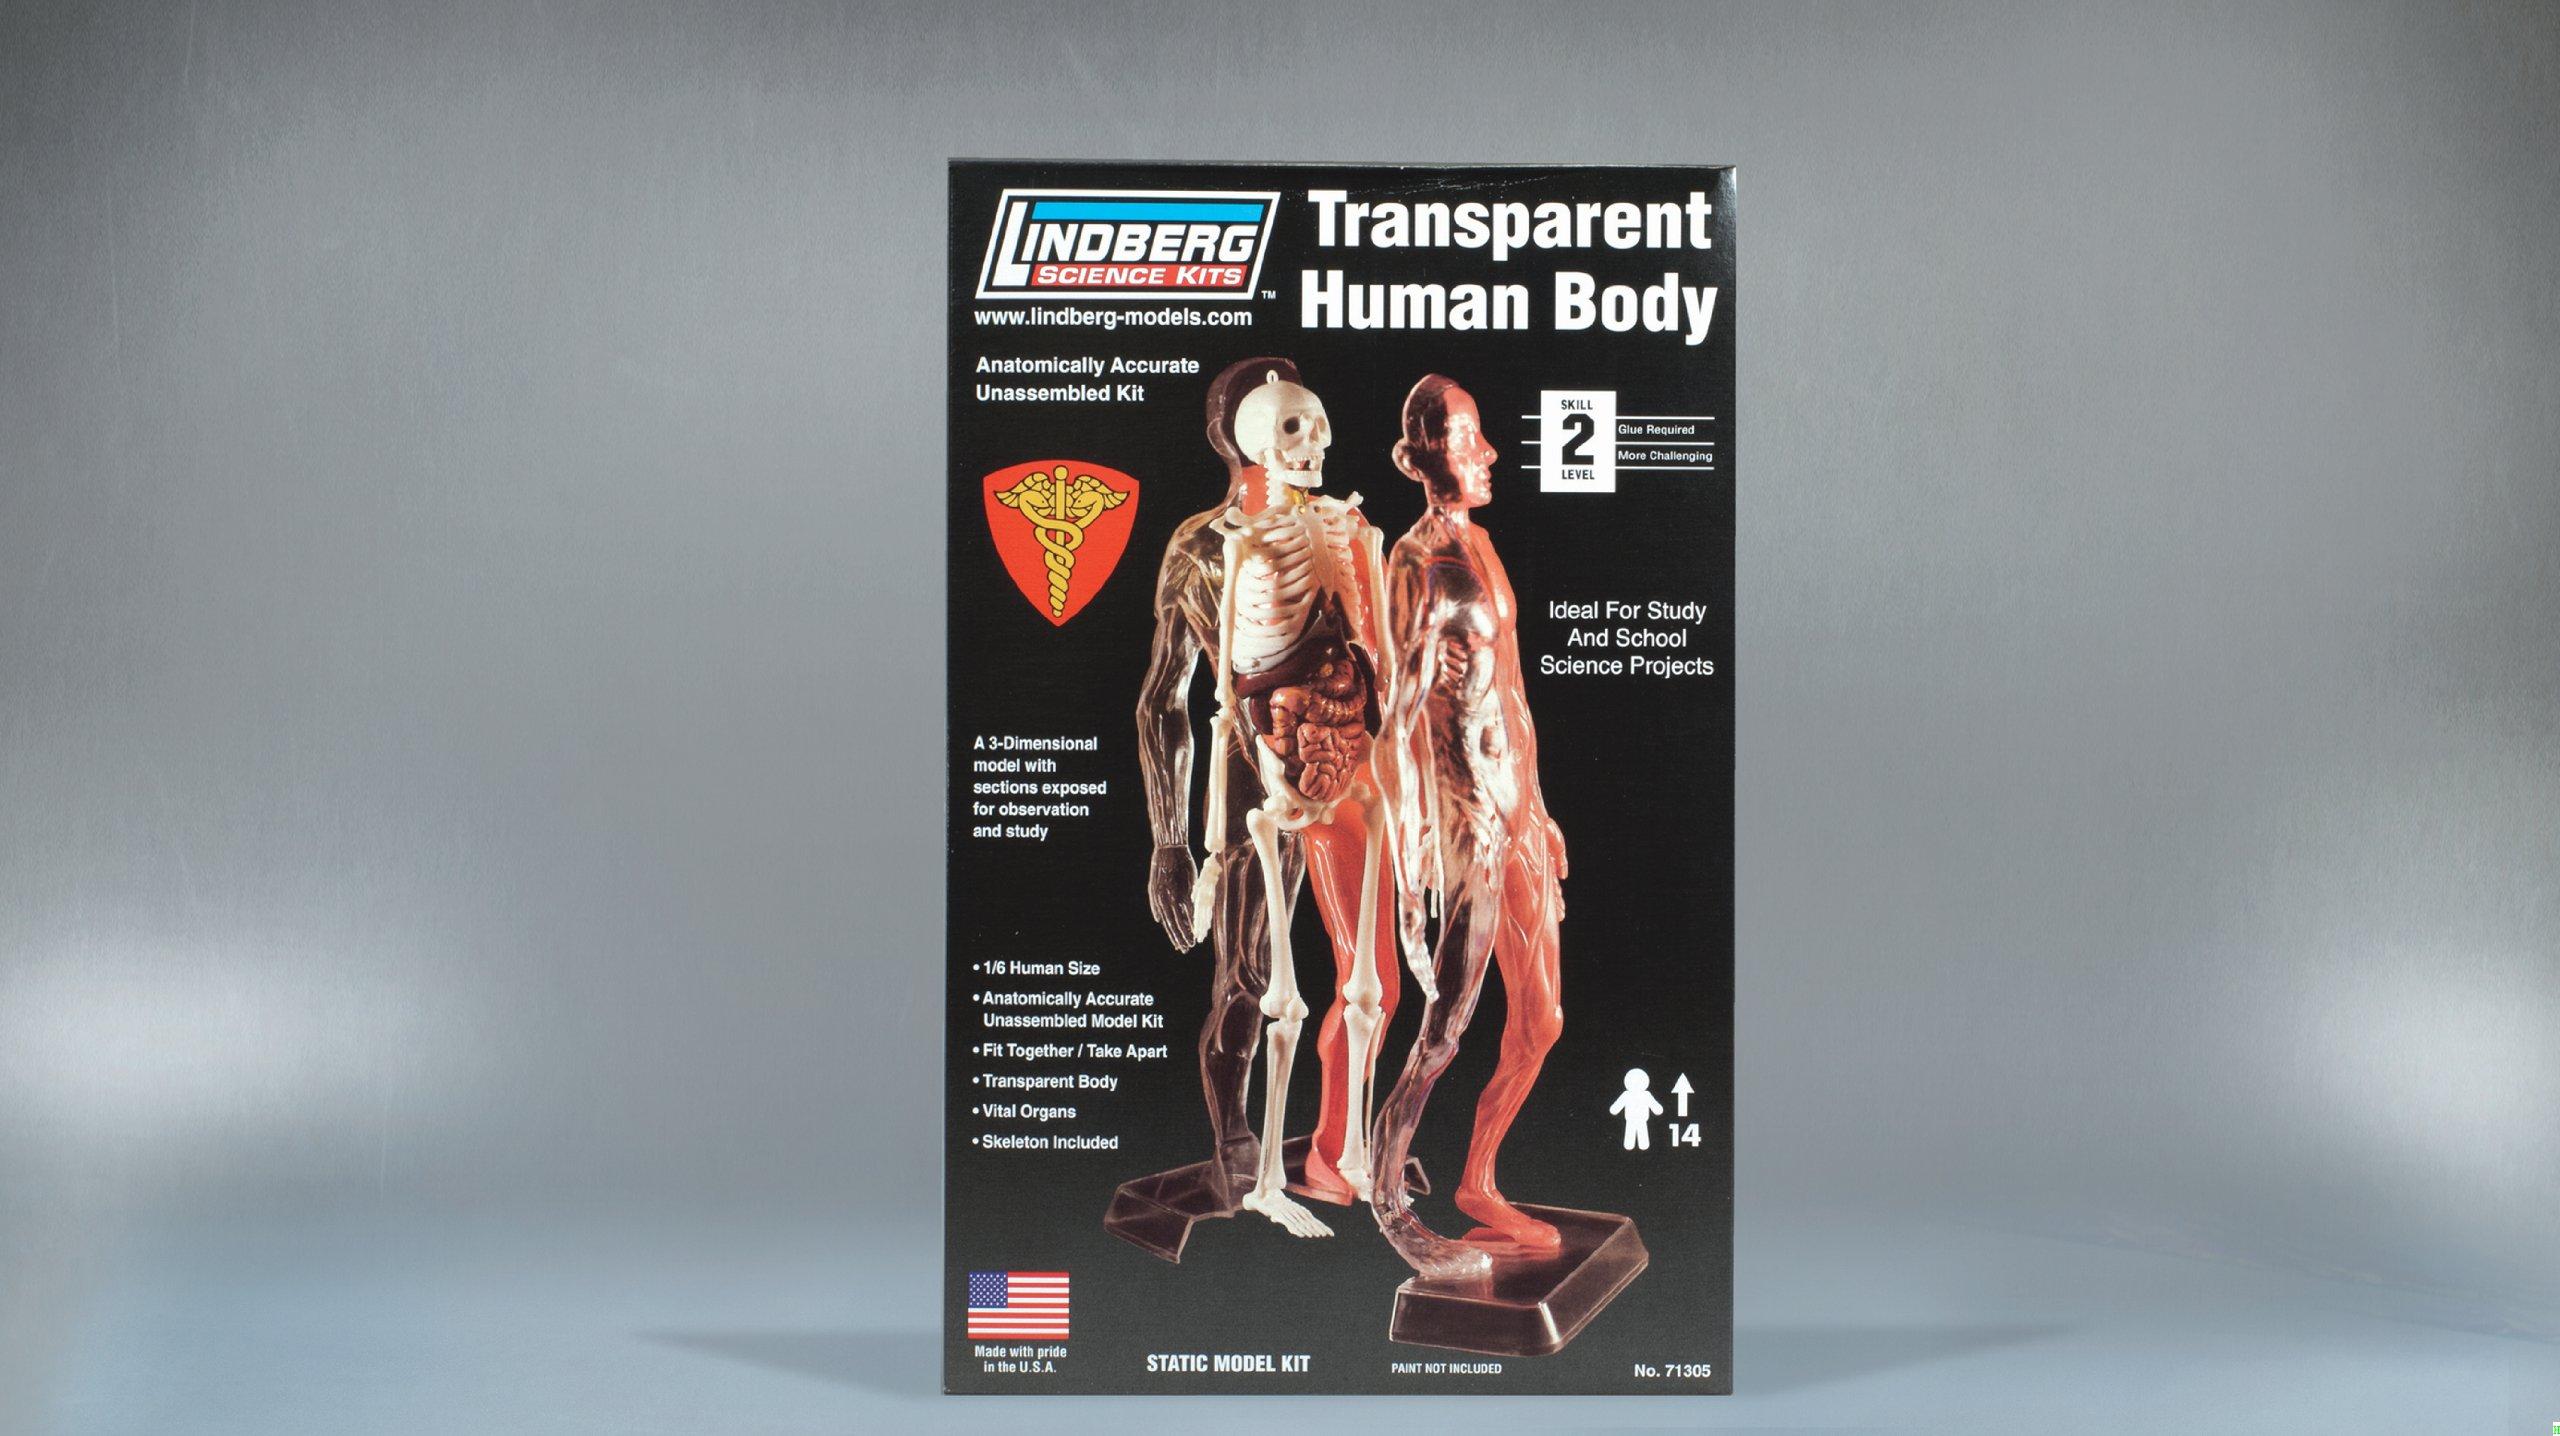 Lindberg Transparent Visible Human Body 1/6 Scale Plastic Model Kit